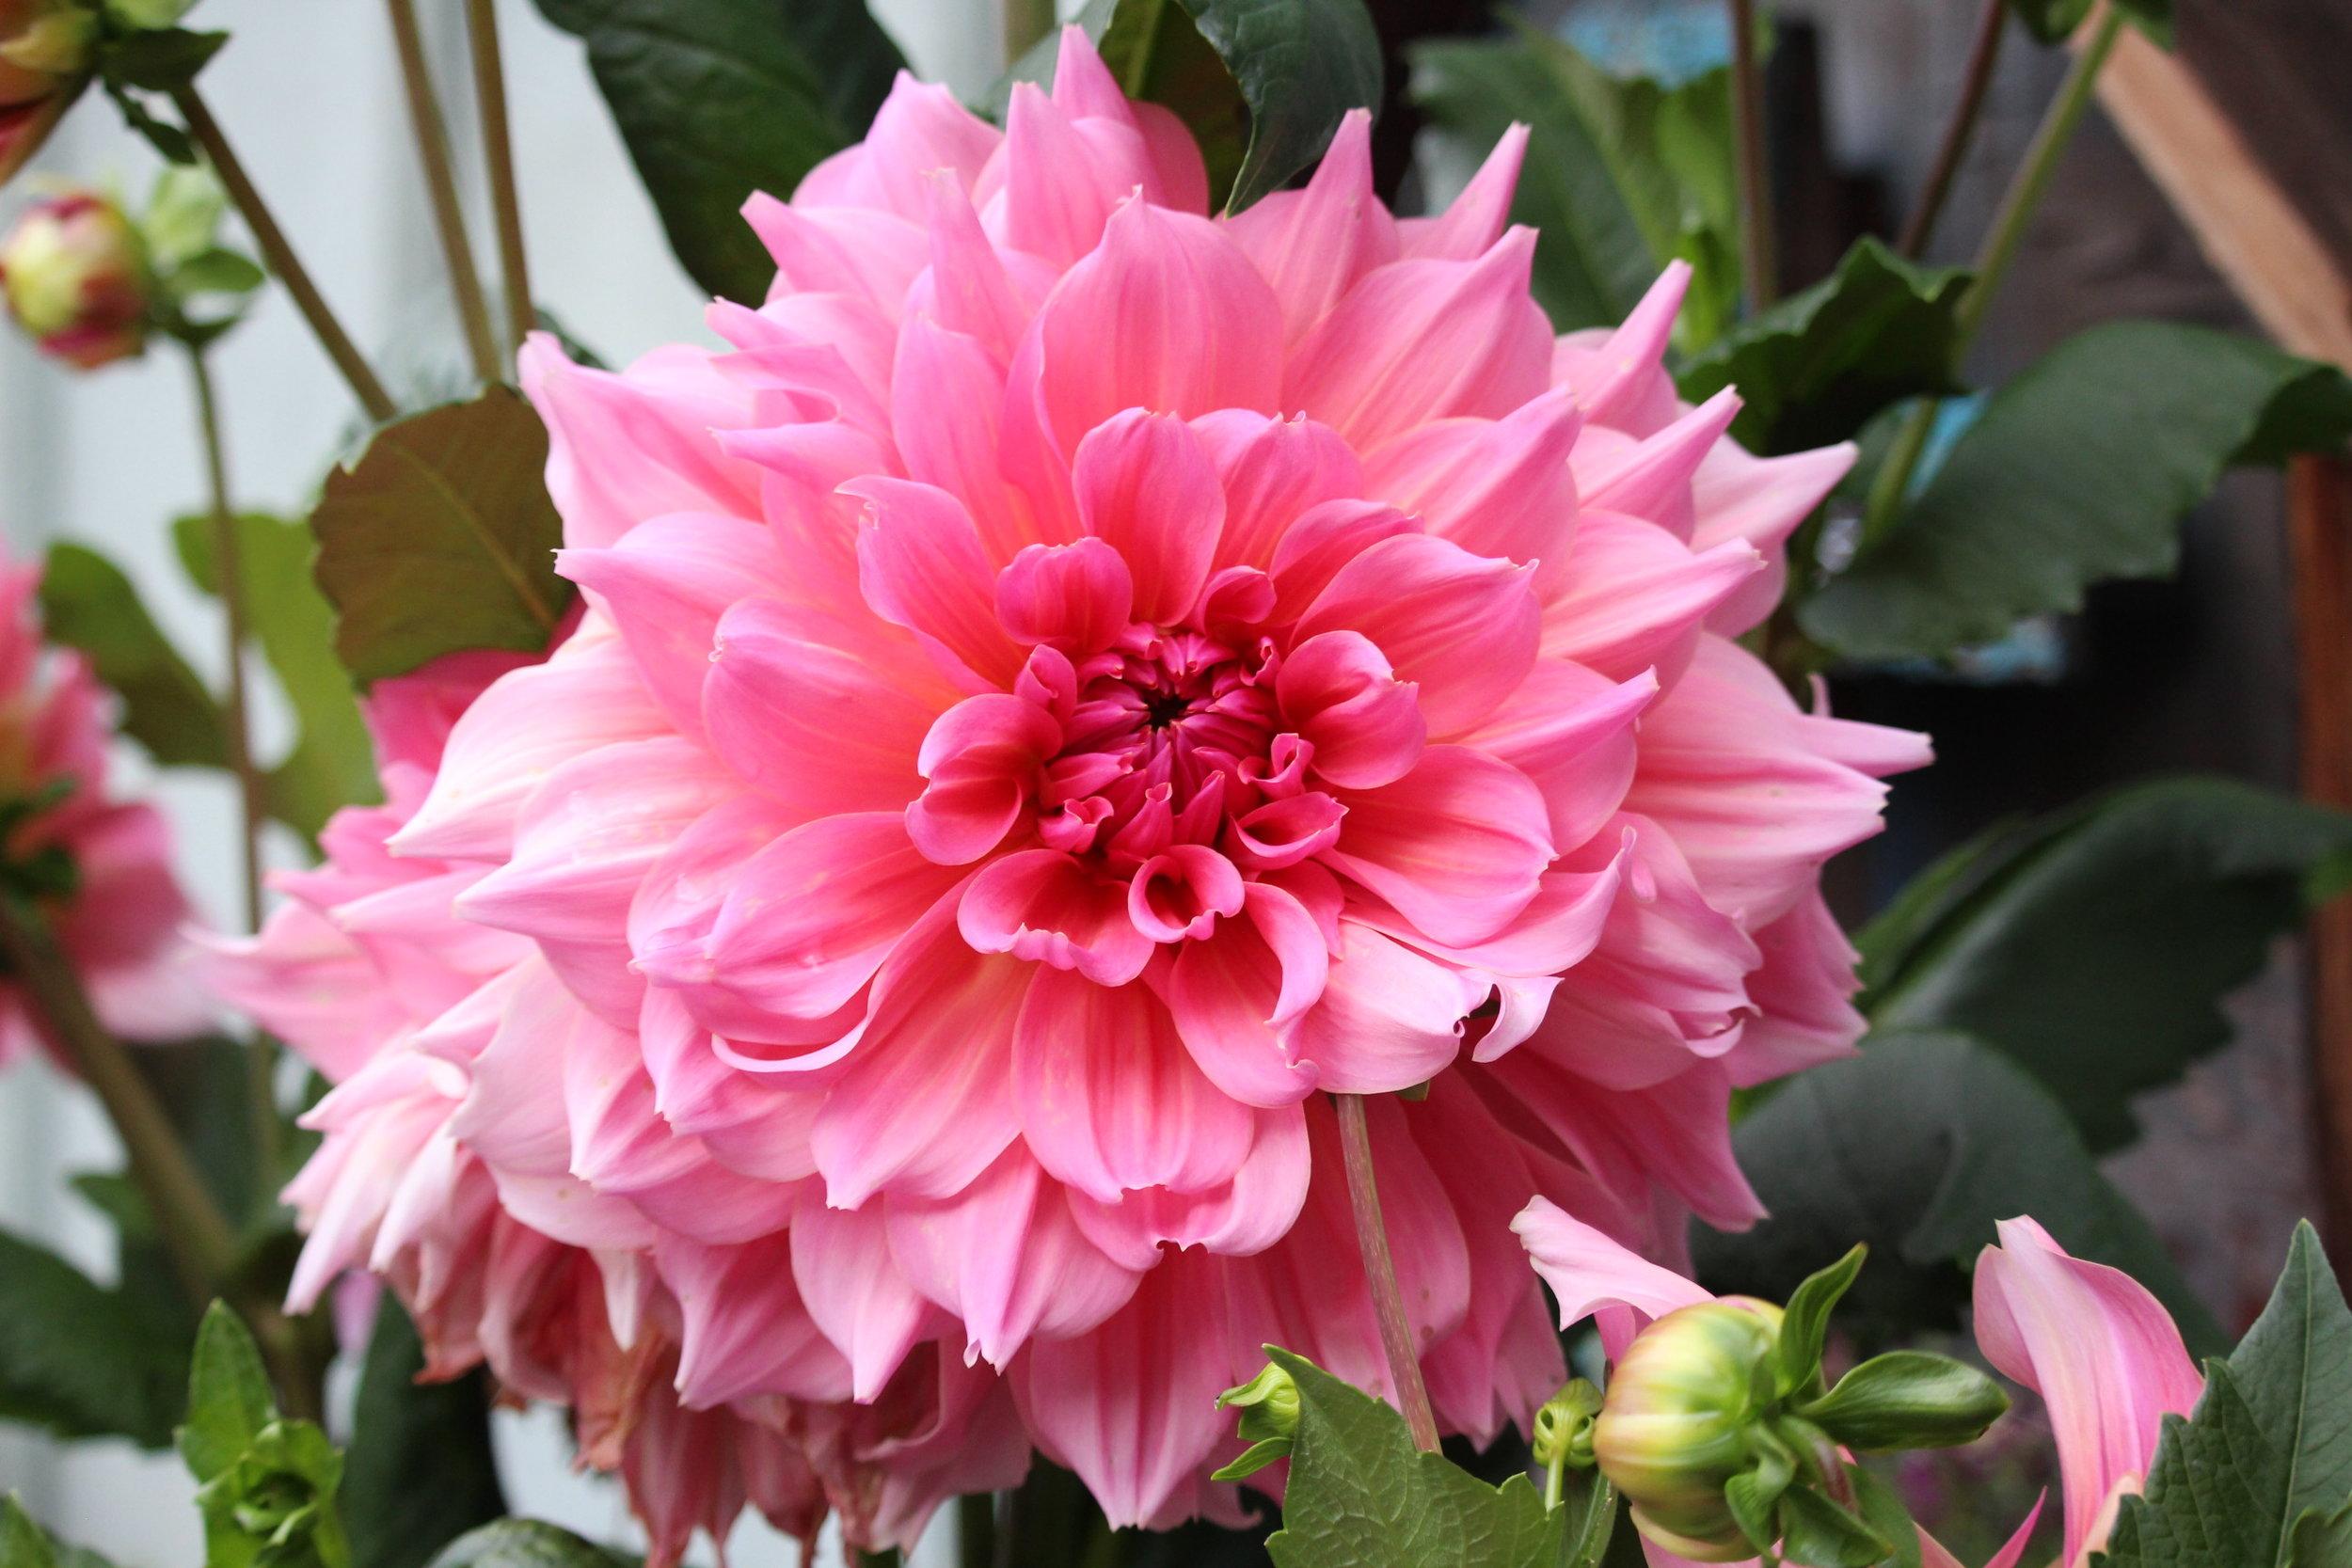 #189 Dahlia, Asteraceae